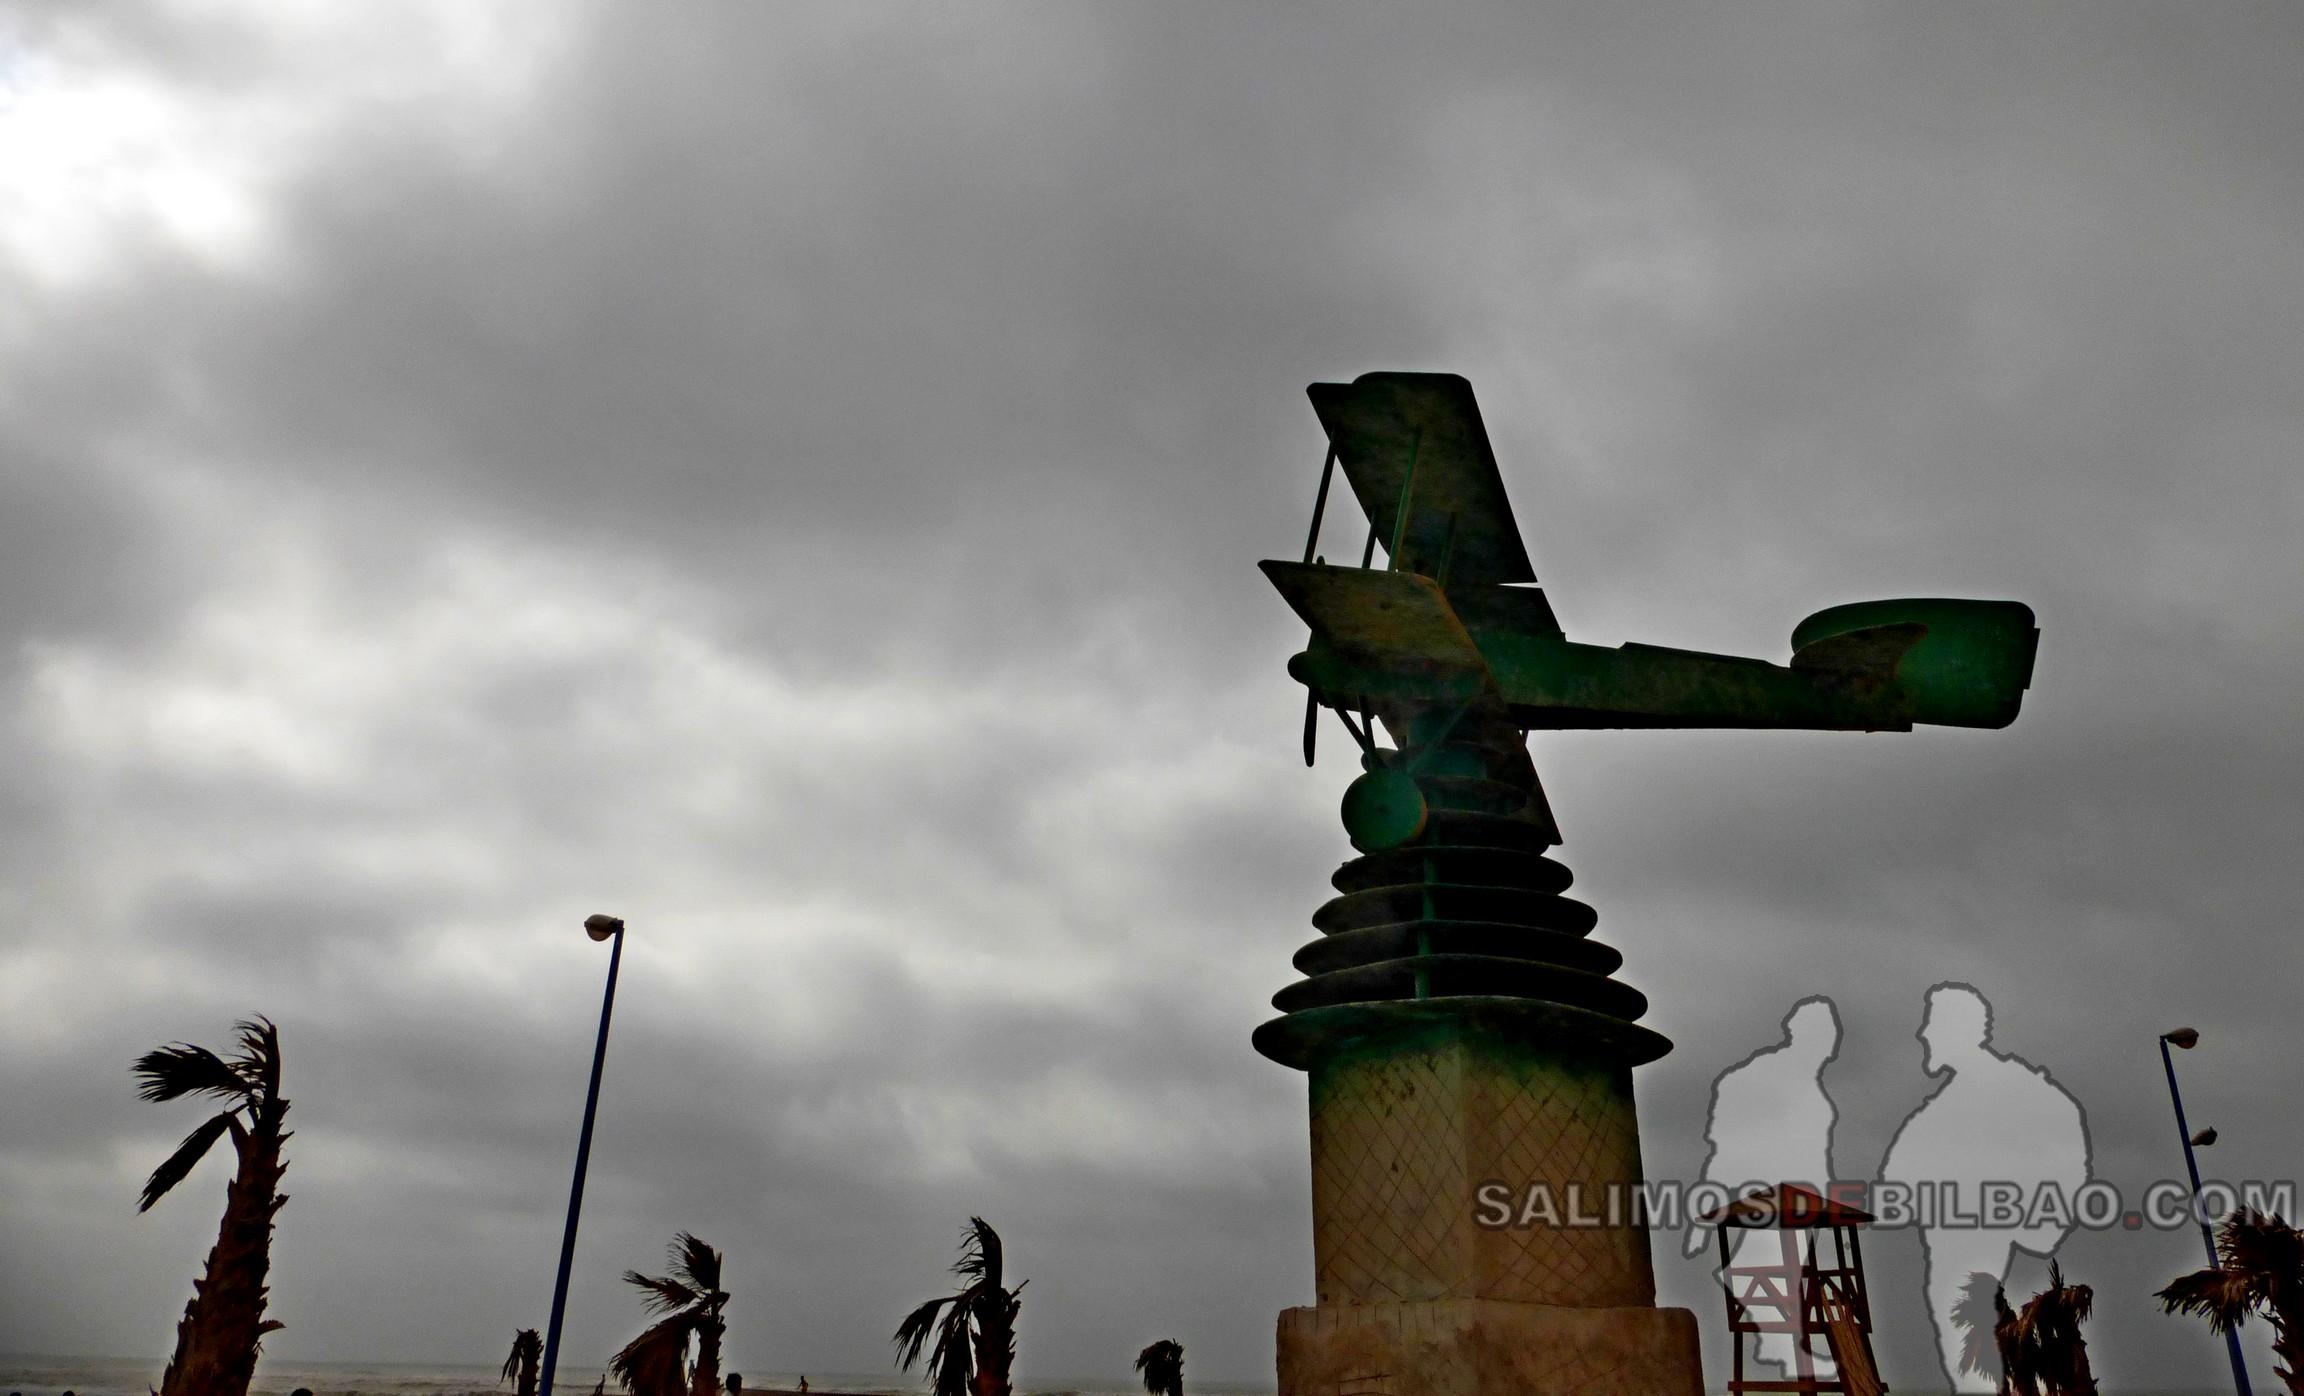 288. Monumento a Saint Exupery, Tarfaya